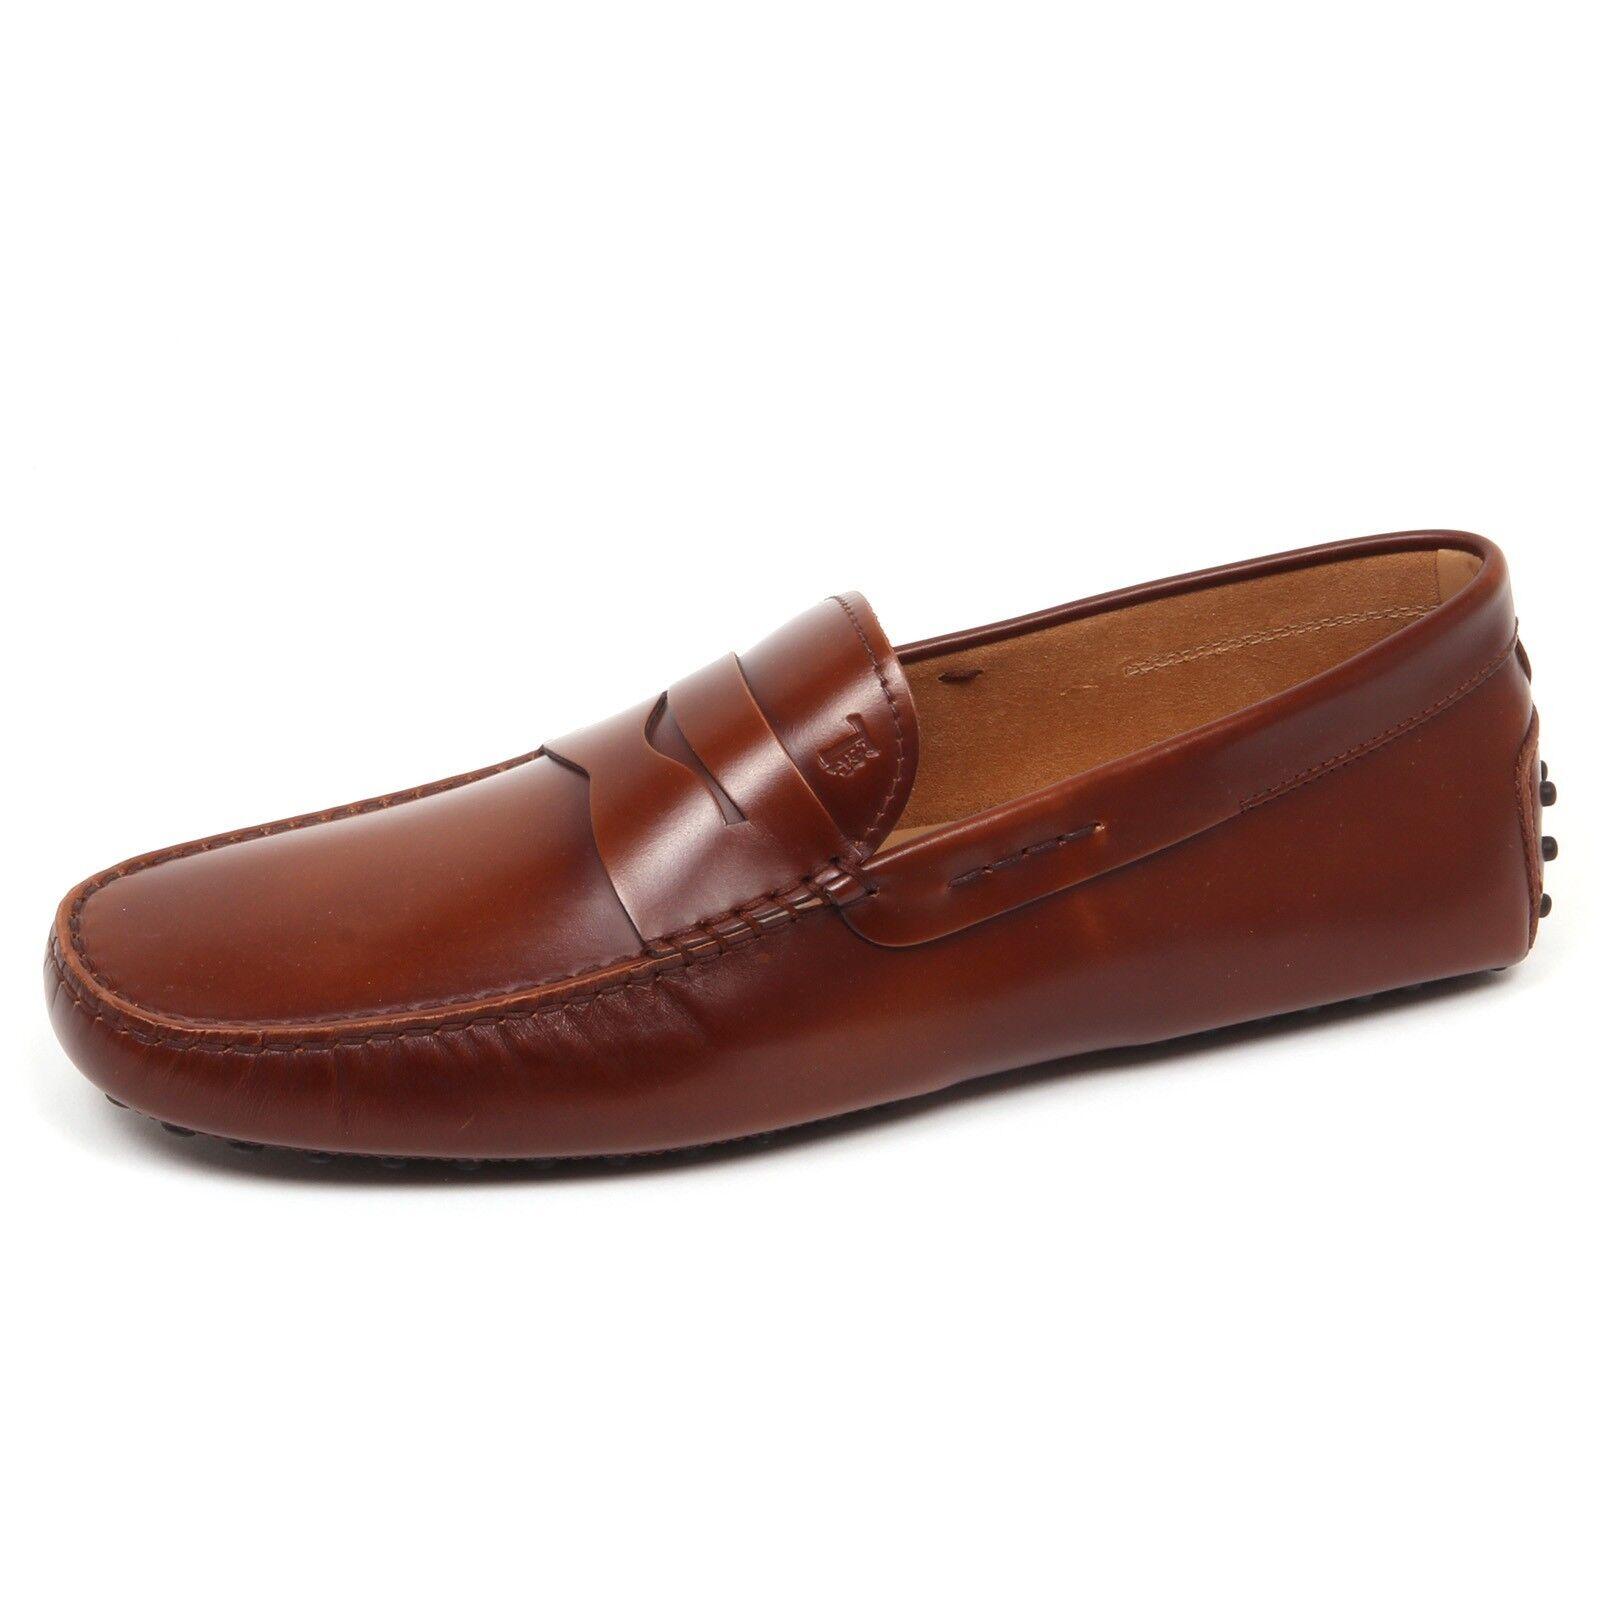 E3648 mocassino uomo brown TOD'S scarpe shoe loafer man